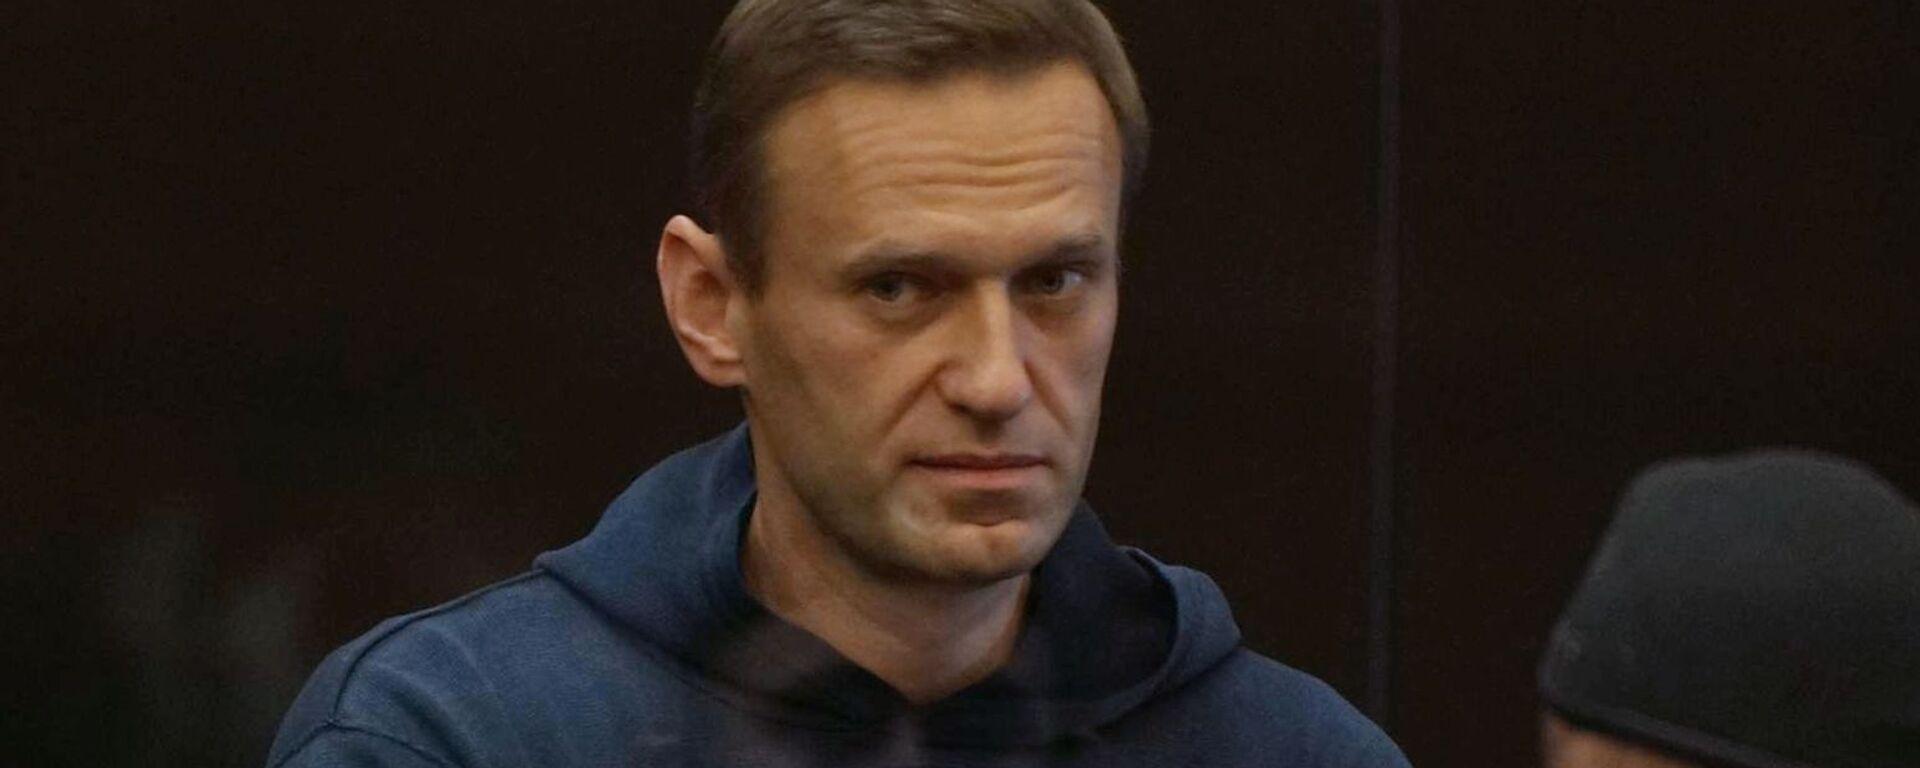 Alexéi Navalni, opositor ruso - Sputnik Mundo, 1920, 08.02.2021